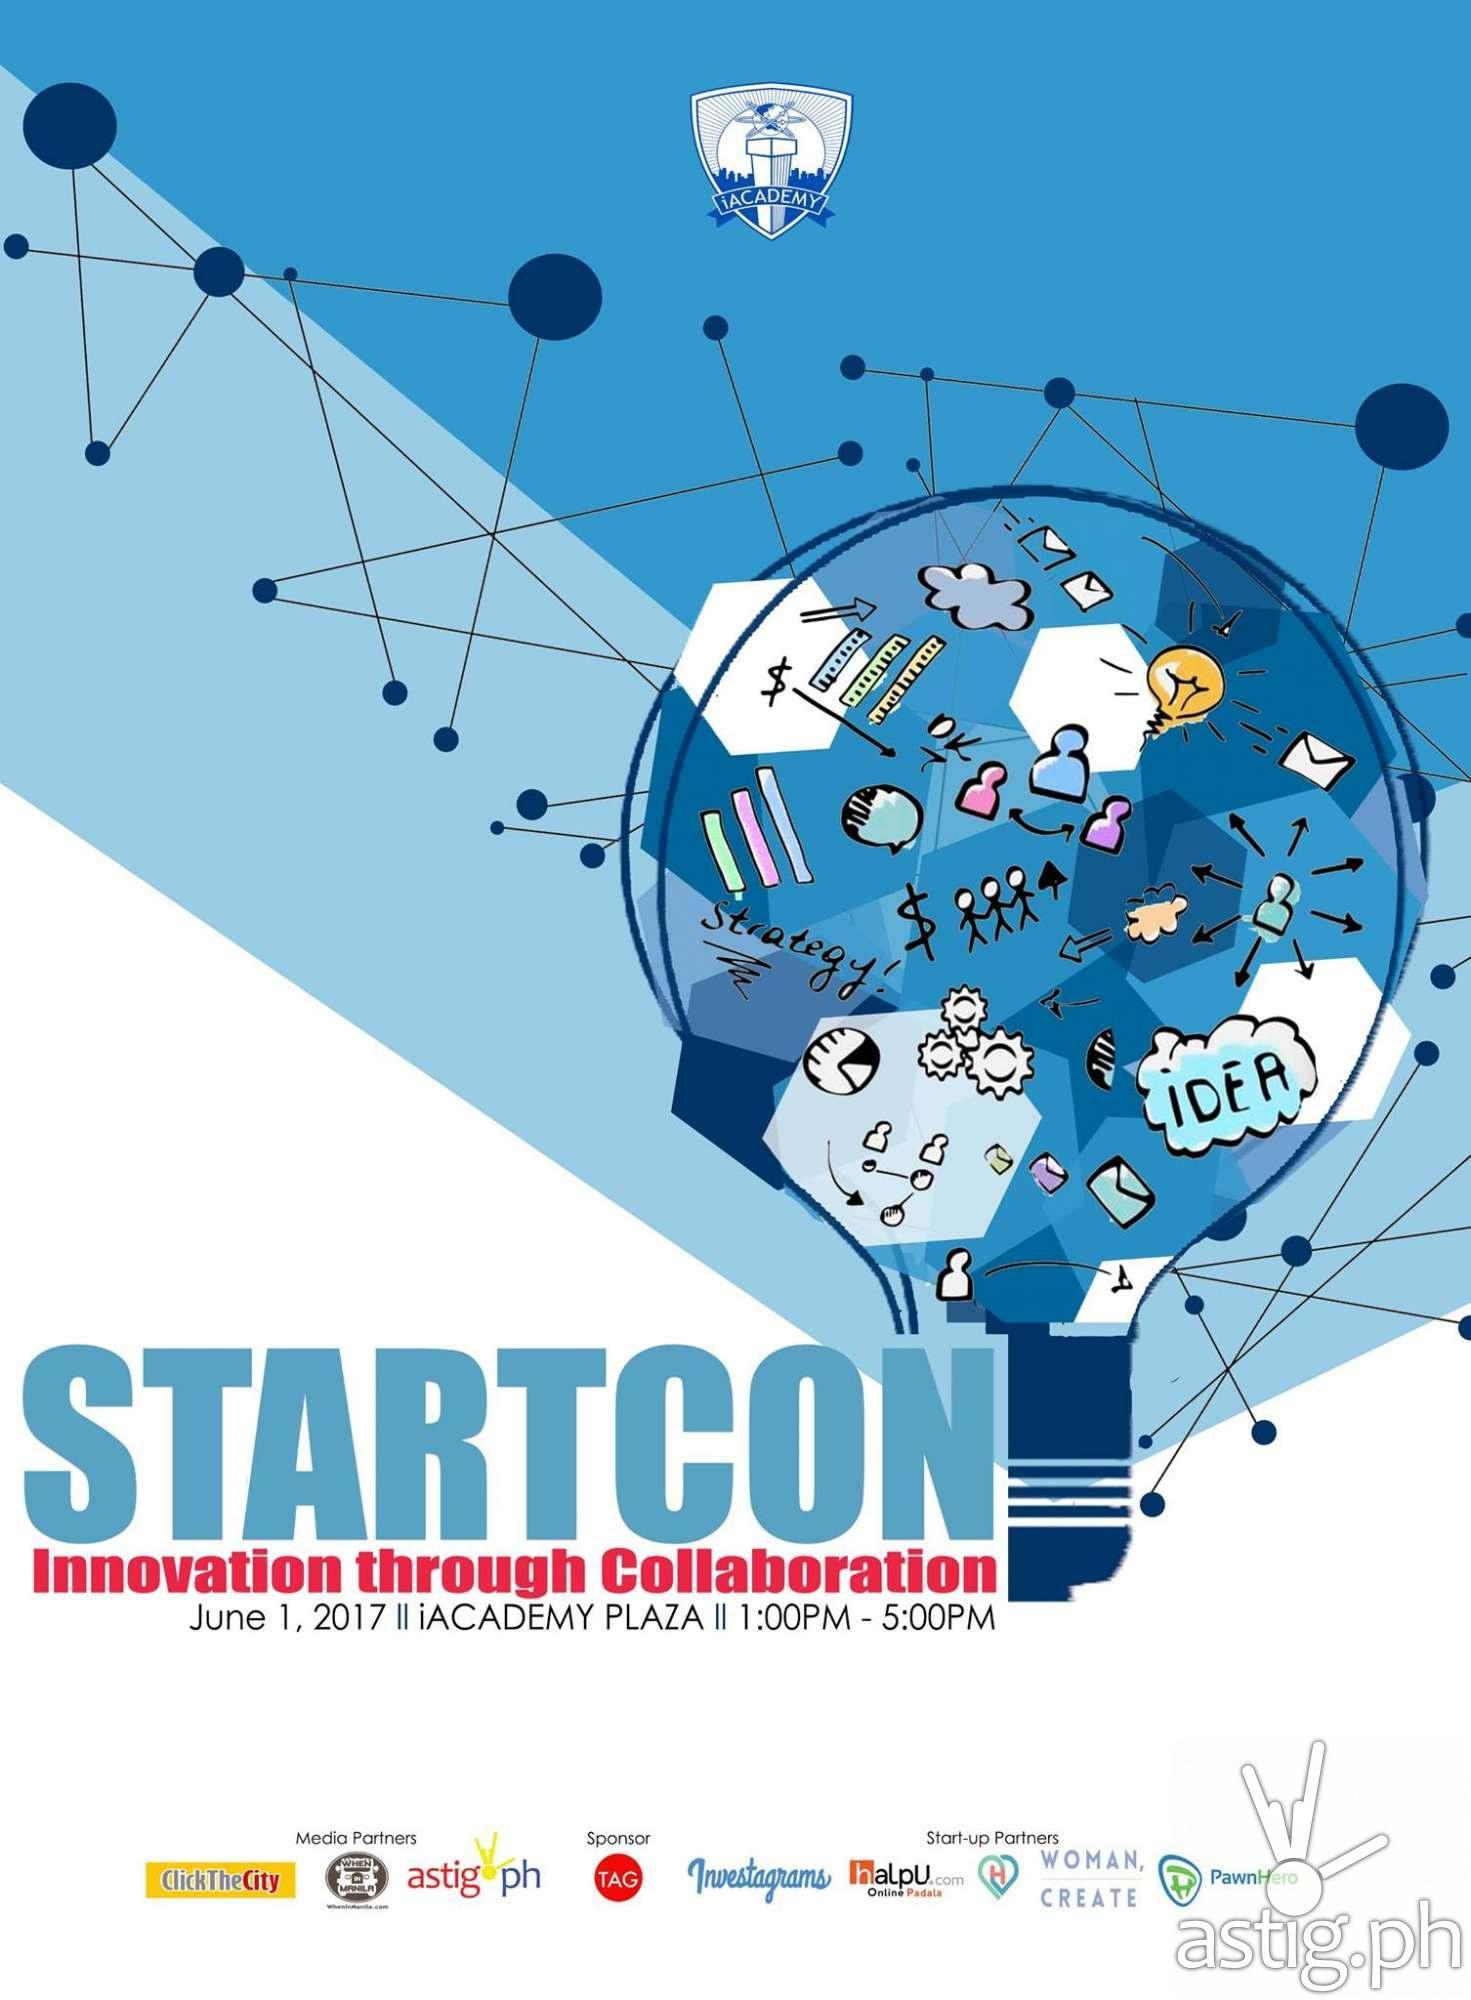 STARTCON Innovation through Collaboration poster